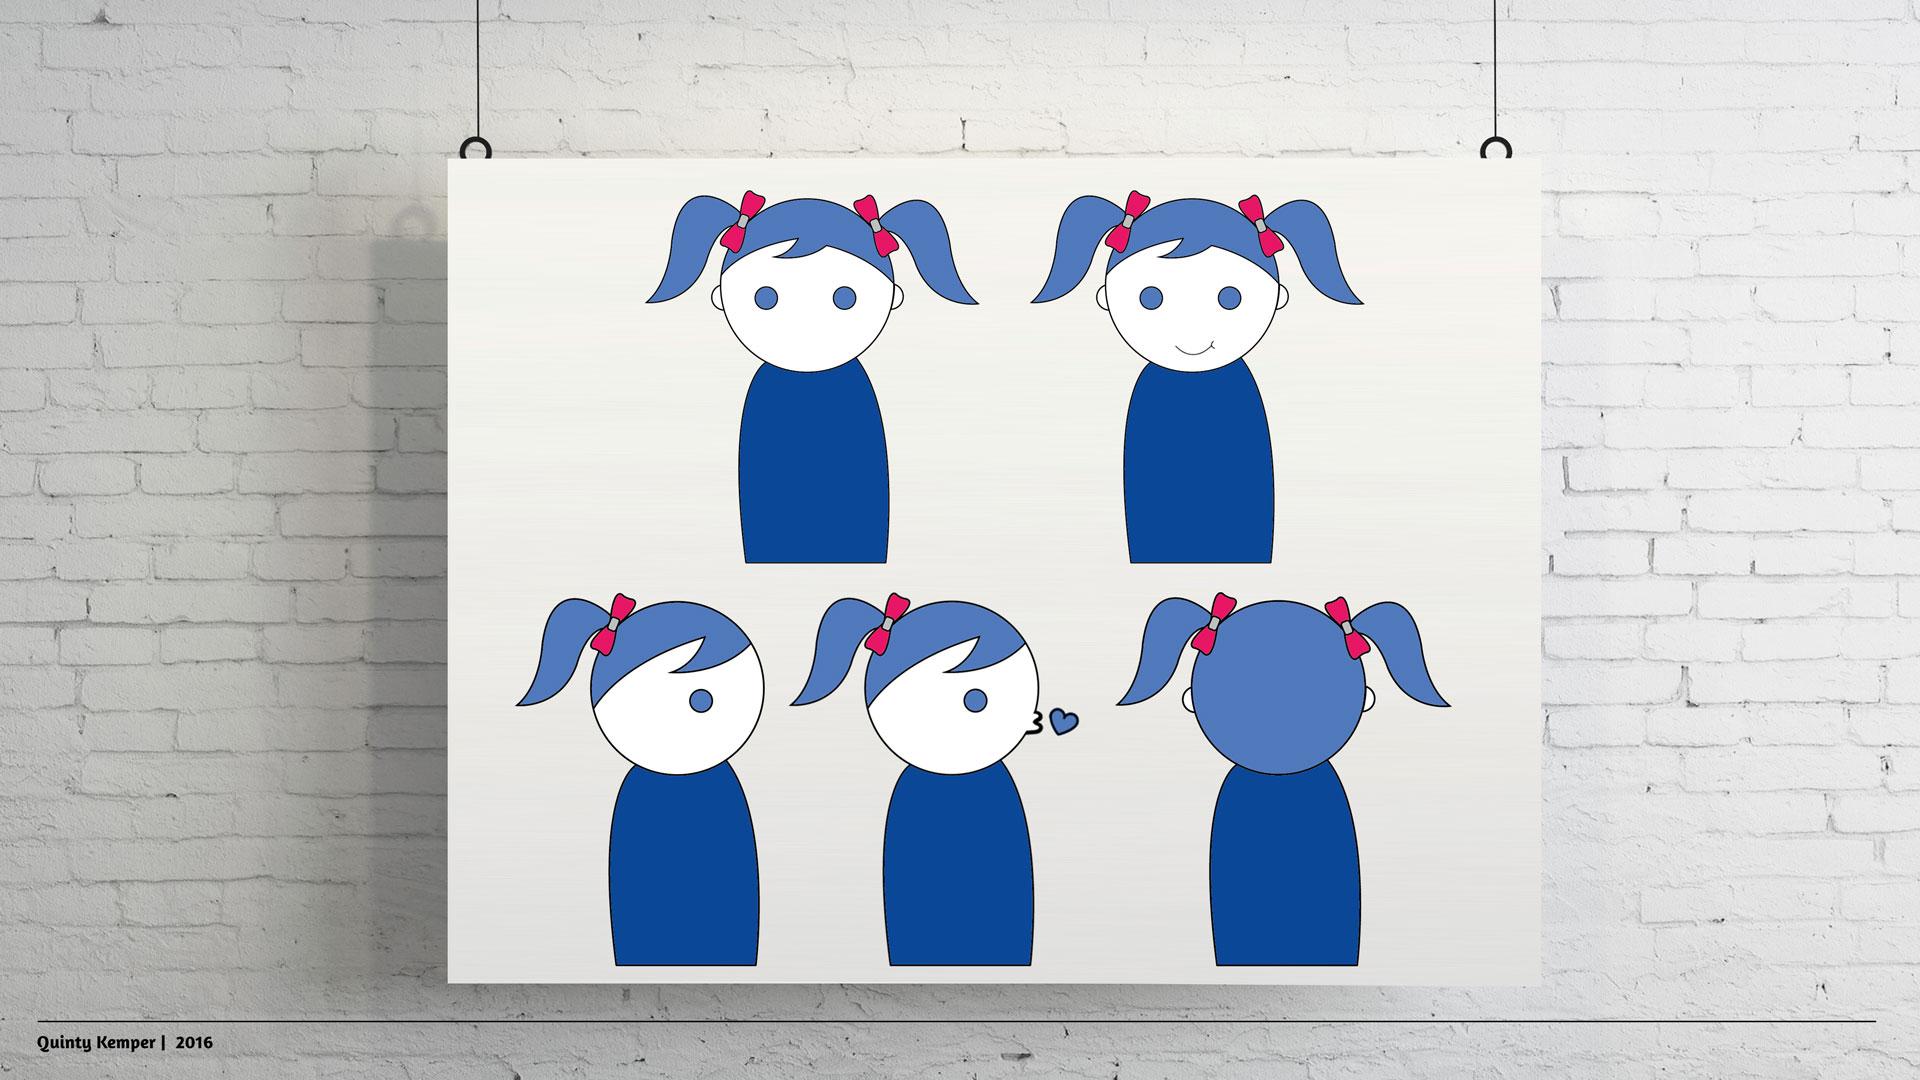 Quinty Kemper Portfolio 2016 Daley character little girl